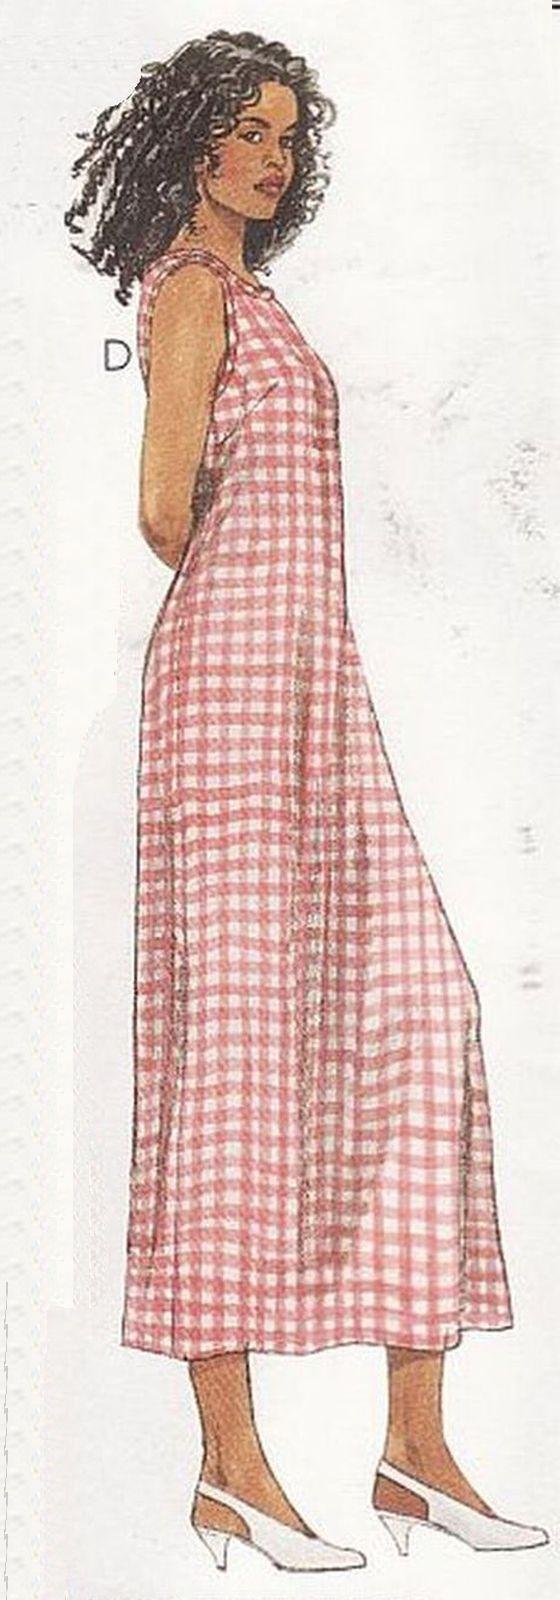 Misses Summer Office Work Pullover Aline Scoop Neck 1 Hr. Dress Sew Pattern 8-12